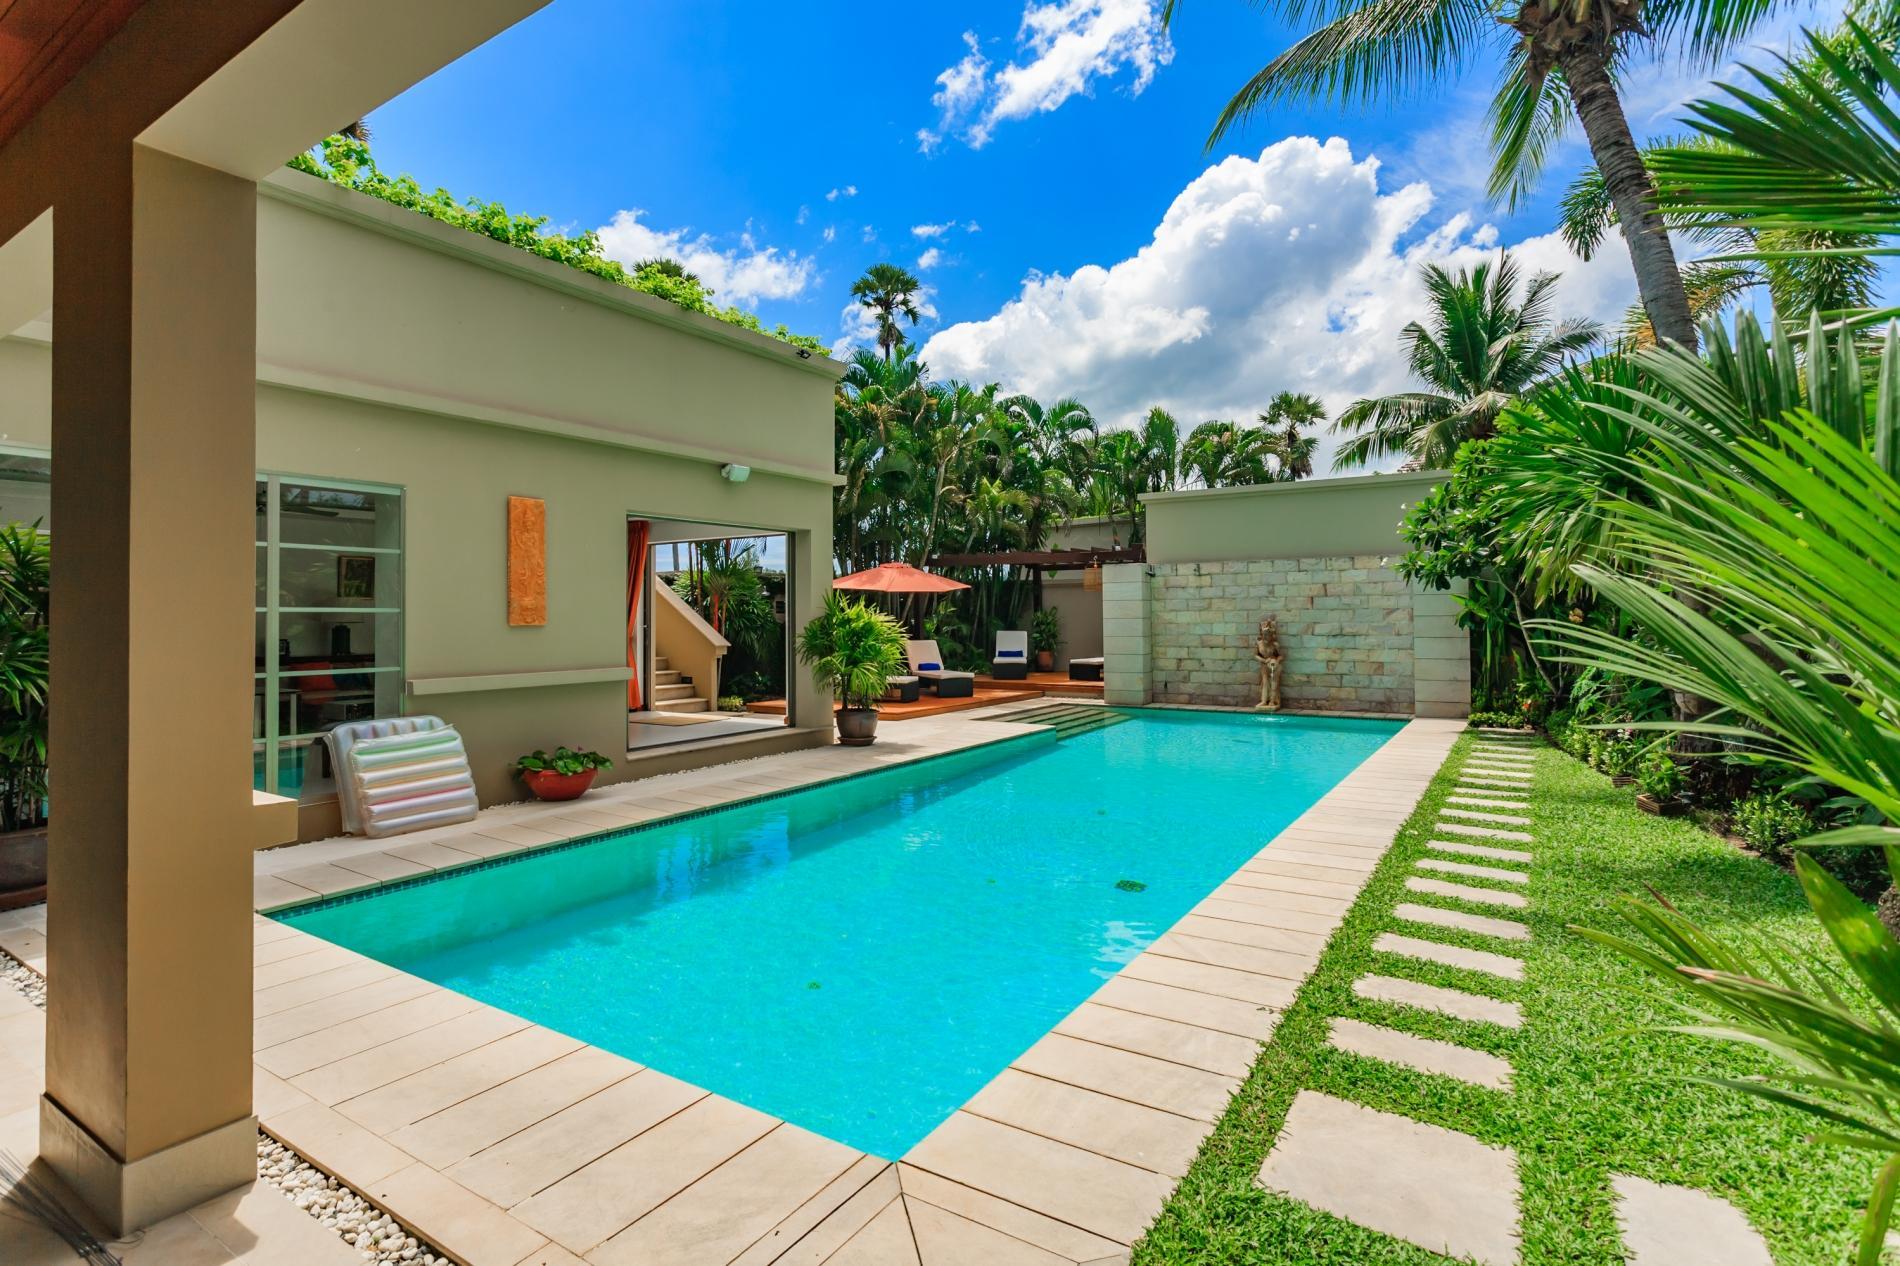 TR105 - Private pool 3 bedroom villa in Bang Tao Residence photo 5733087